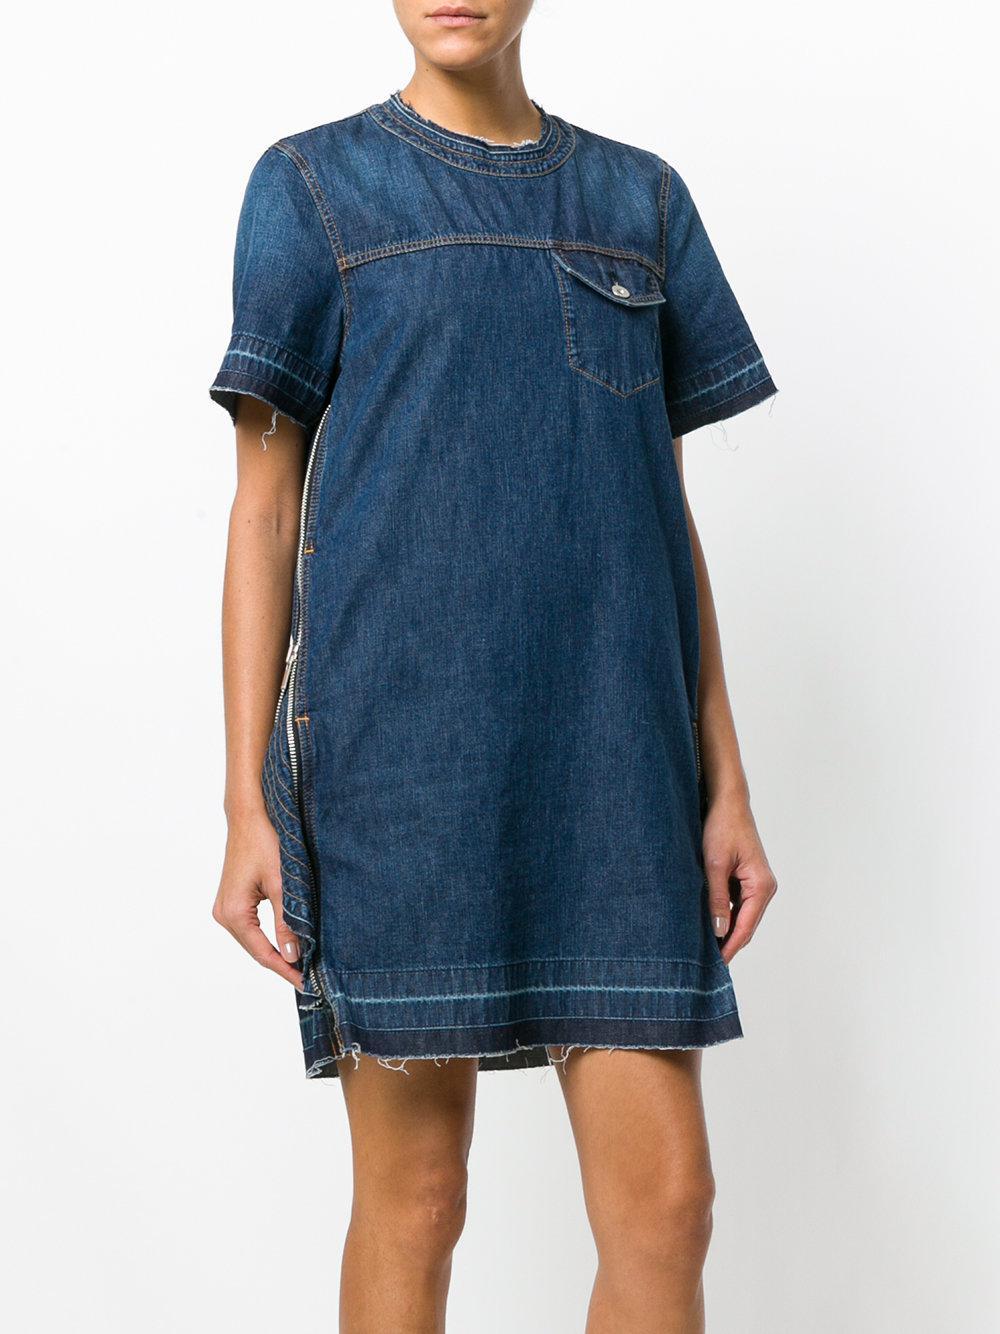 8bcf2e8d92 Sacai - Blue Denim Zip Embellished Dress - Lyst. View fullscreen